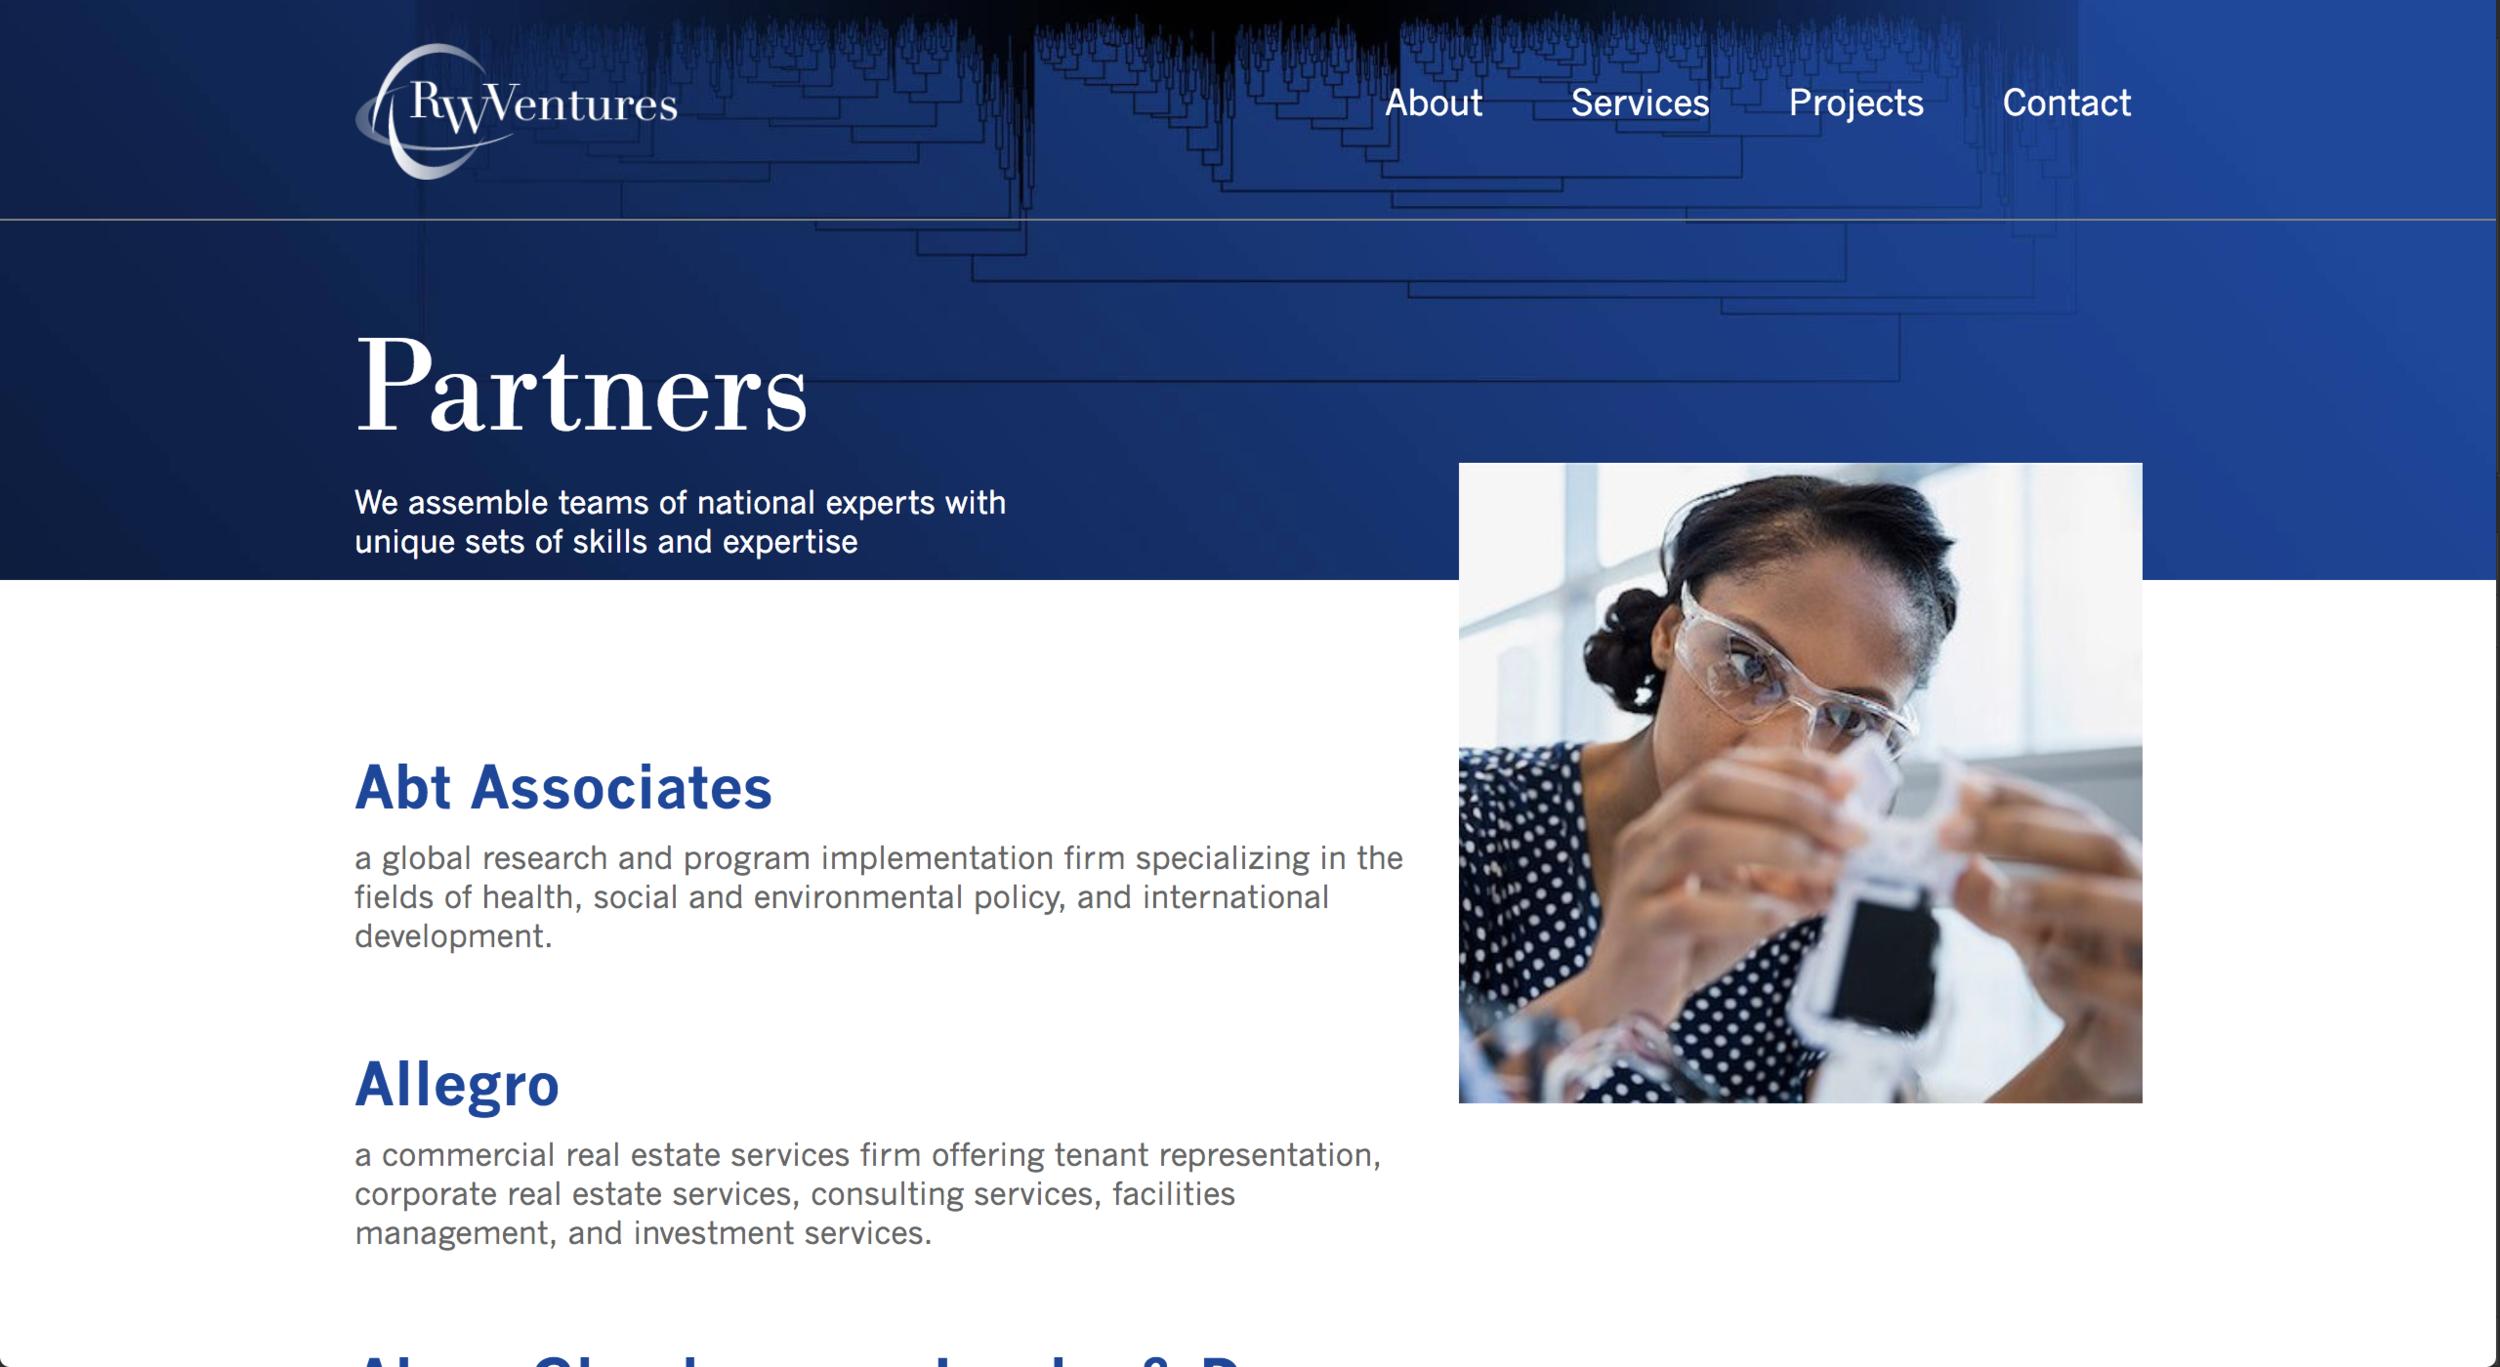 partners_rw-ventures.png